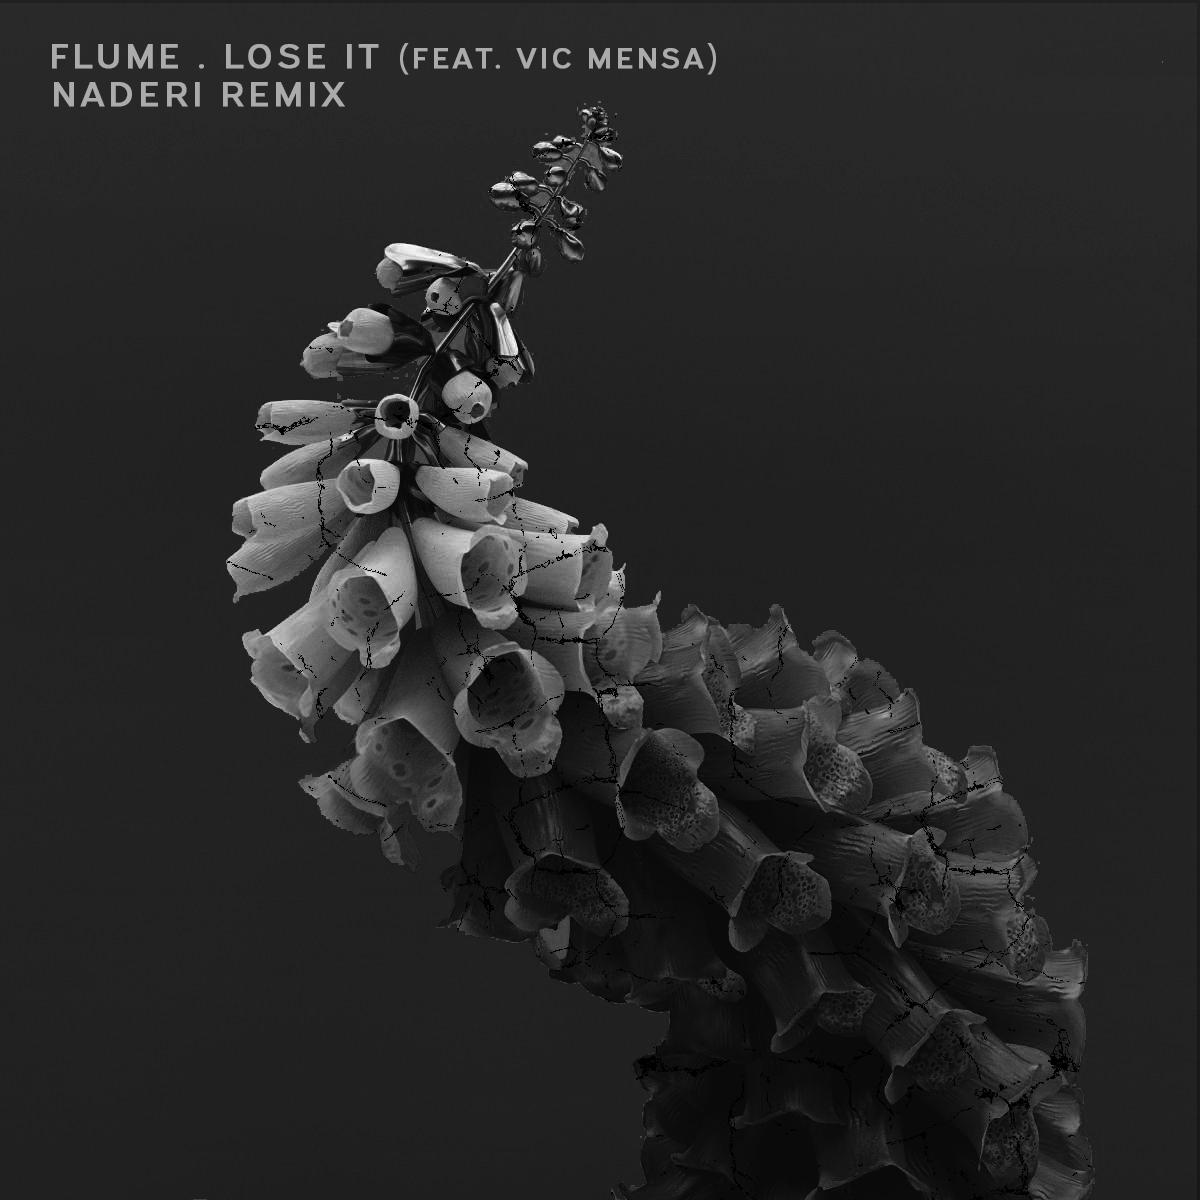 Flume x Naderi Remix Artwork